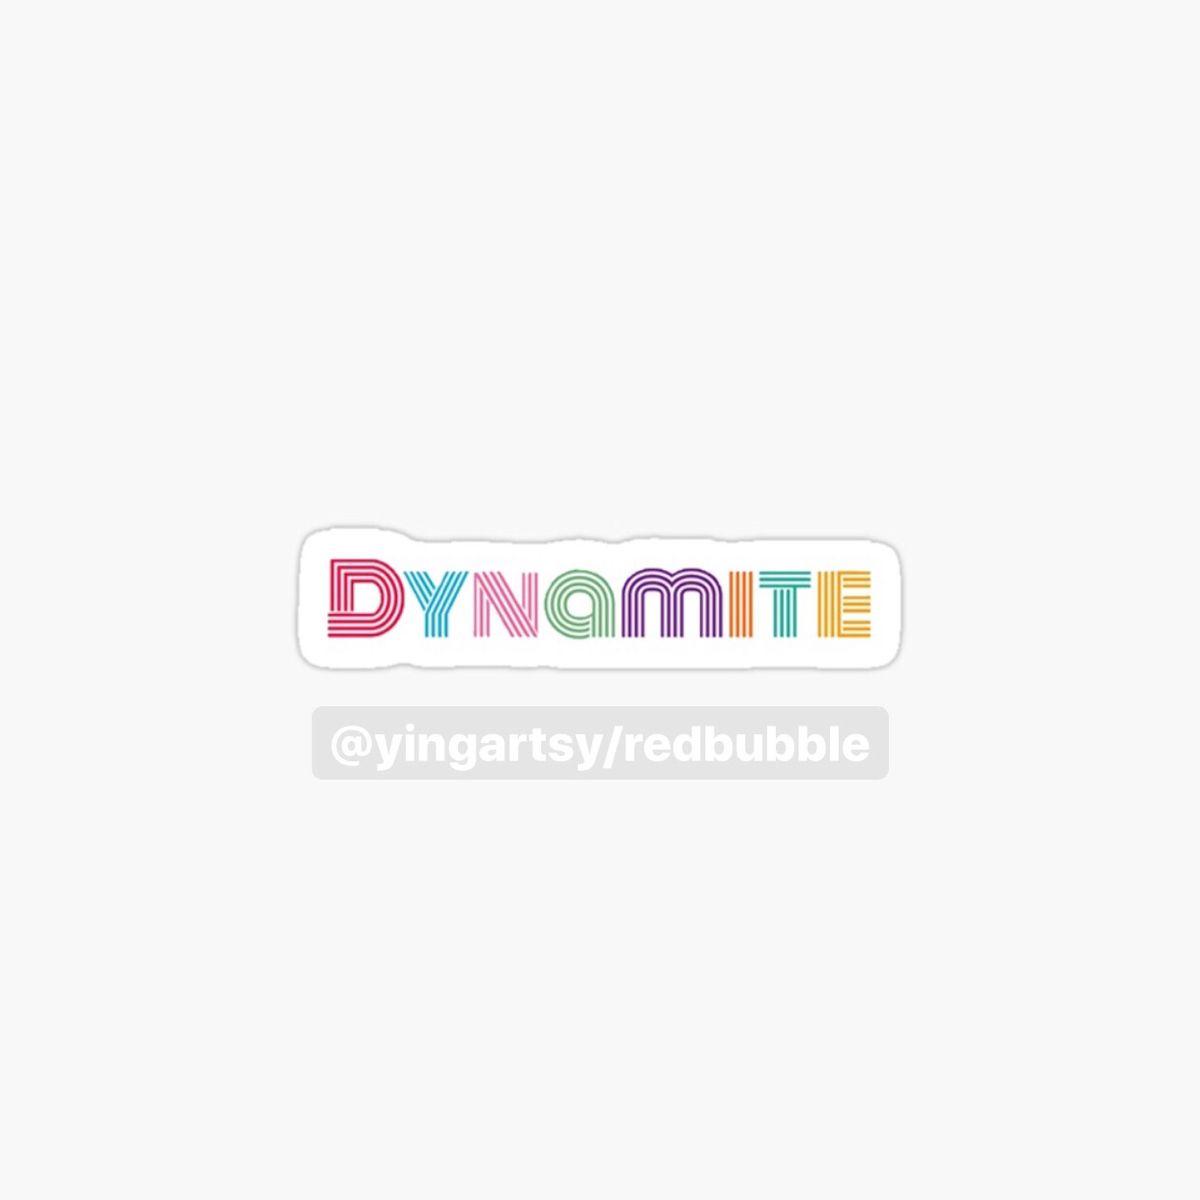 Bts Dynamite Sticker By Yingartsy In 2020 Pop Stickers Stickers Bts